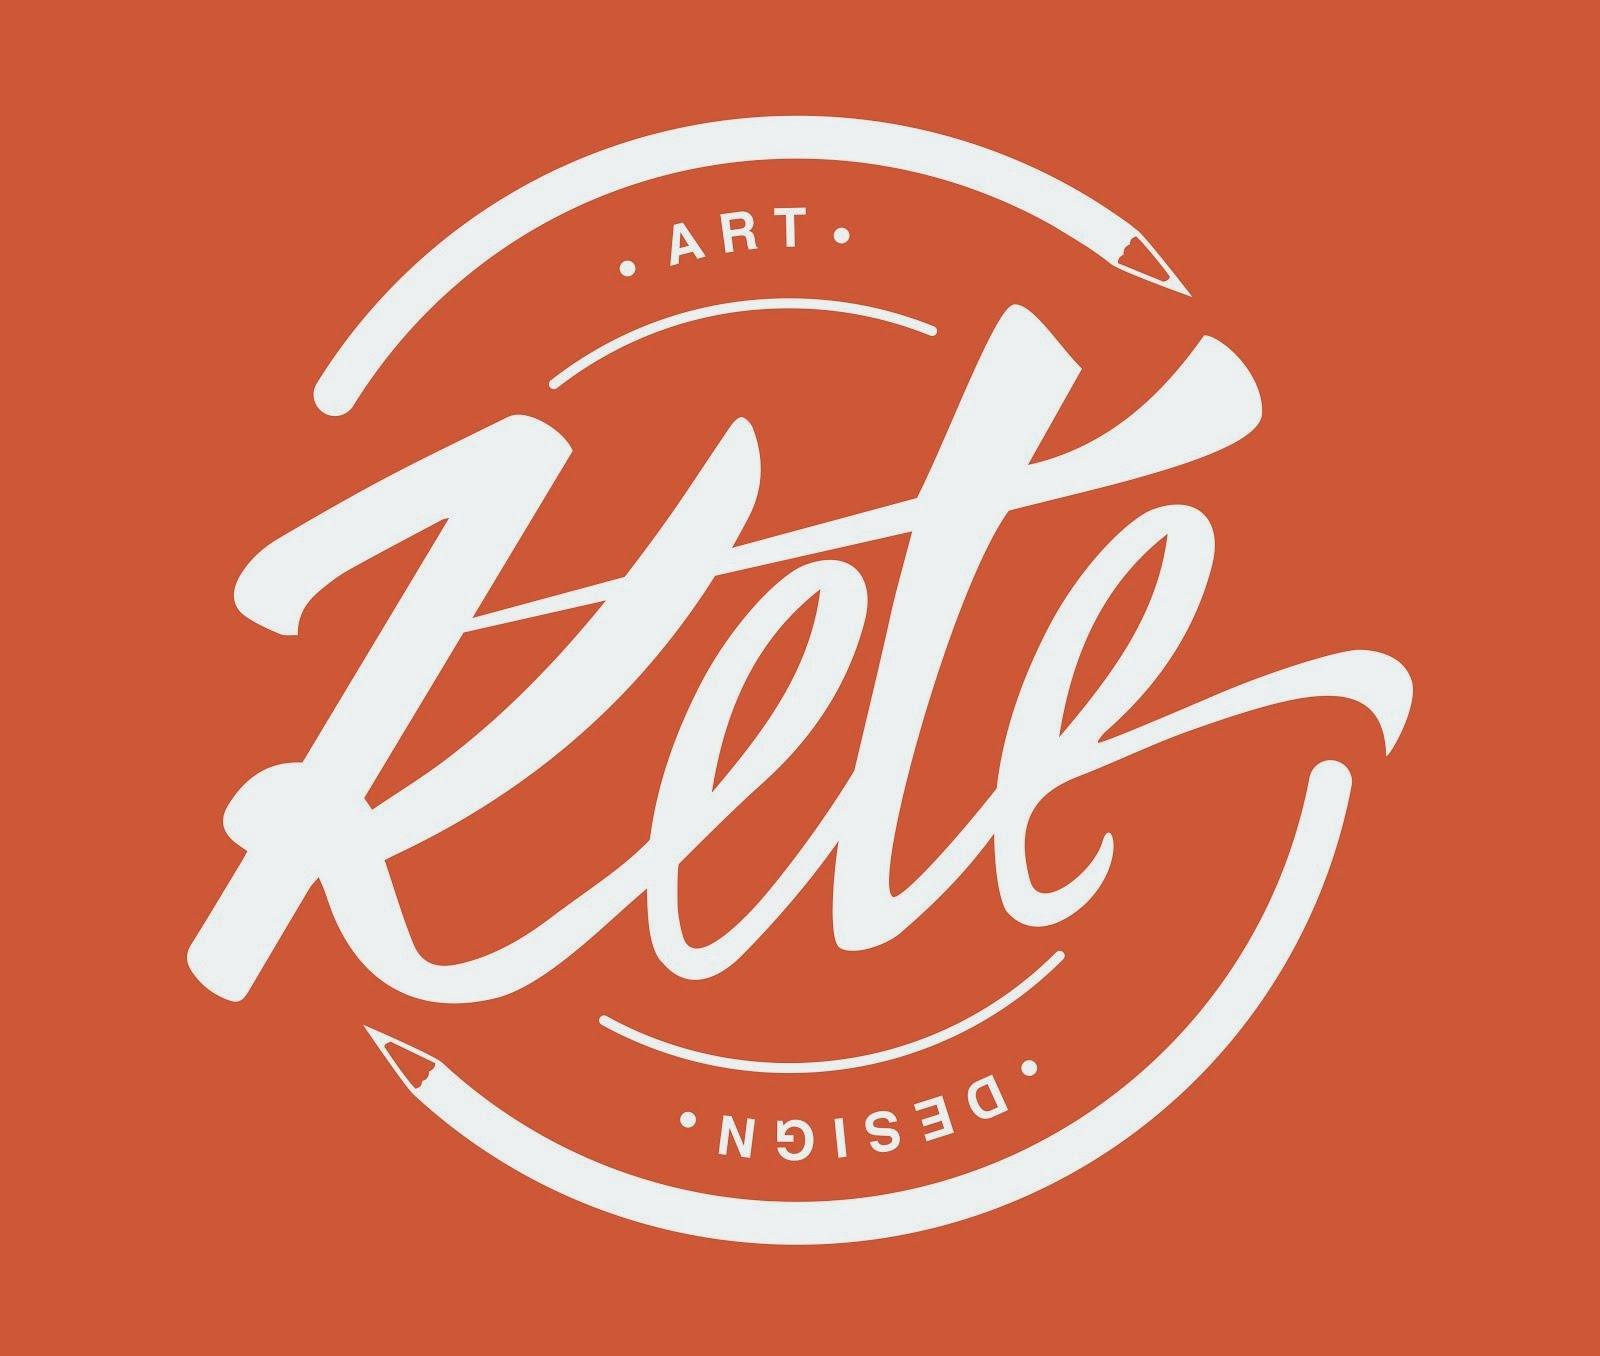 Kete. Il-lustració i disseny